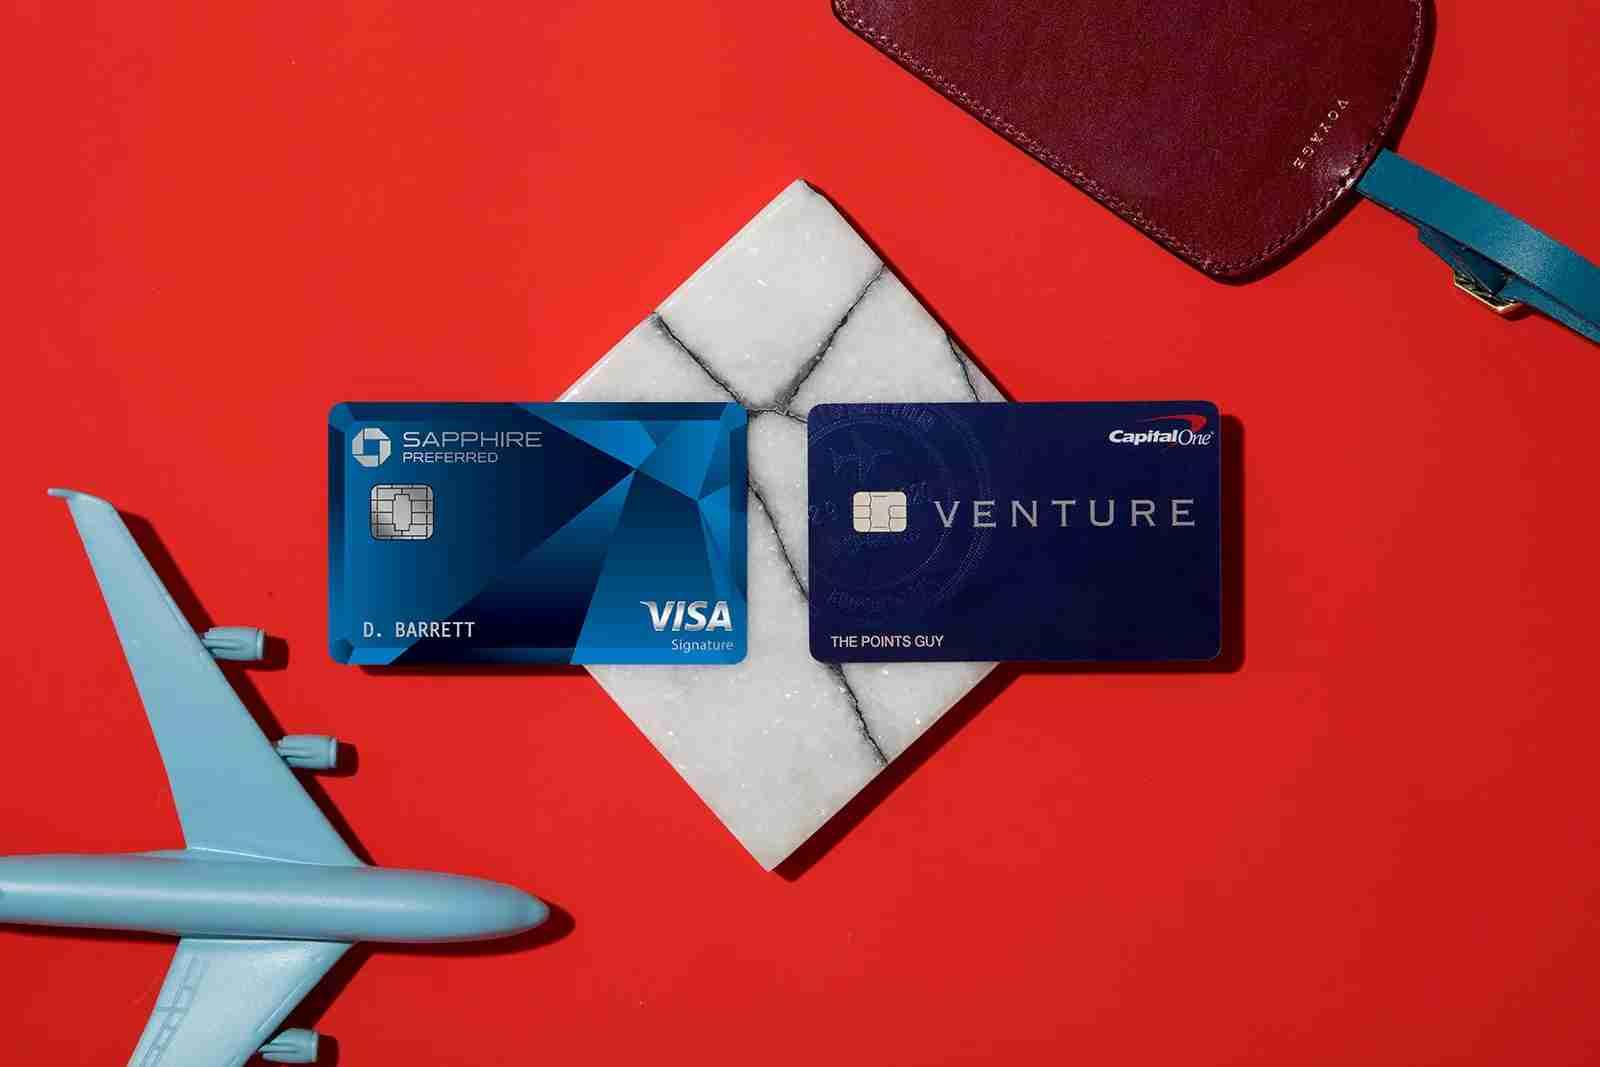 Chase Sapphire Preferred + Capital One Venture Rewards